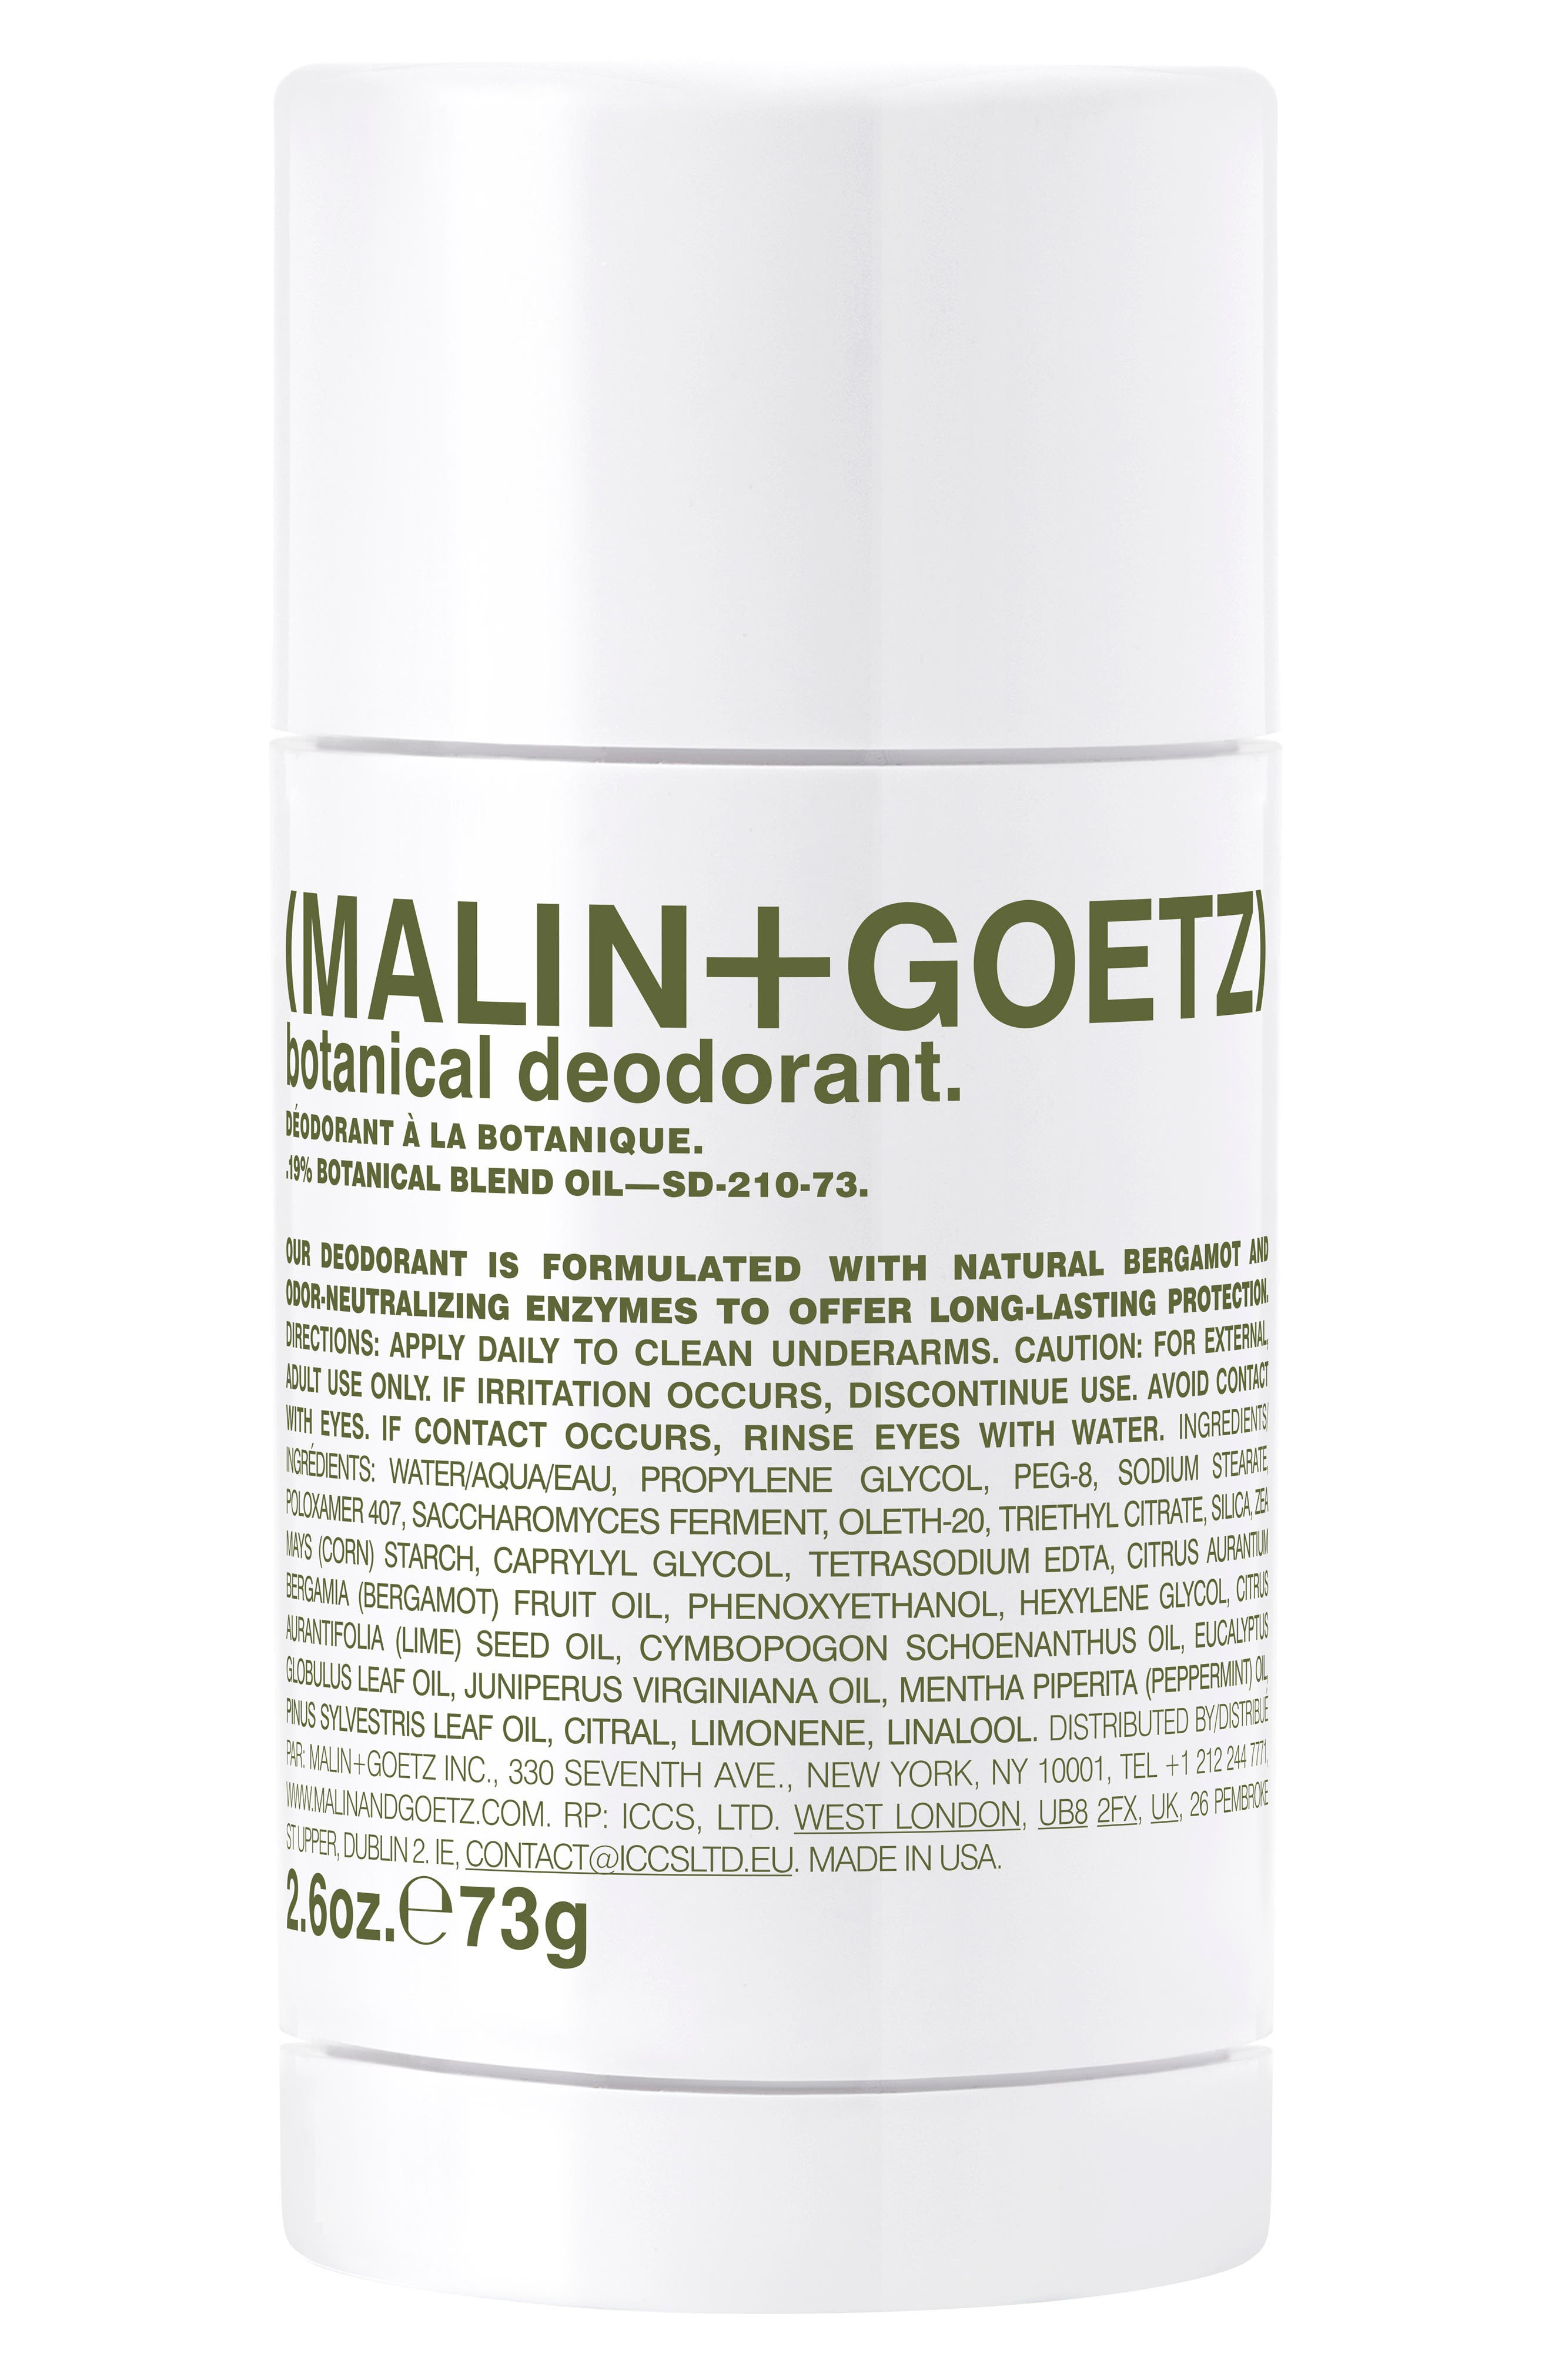 Malin+Goetz Botanical Deodorant